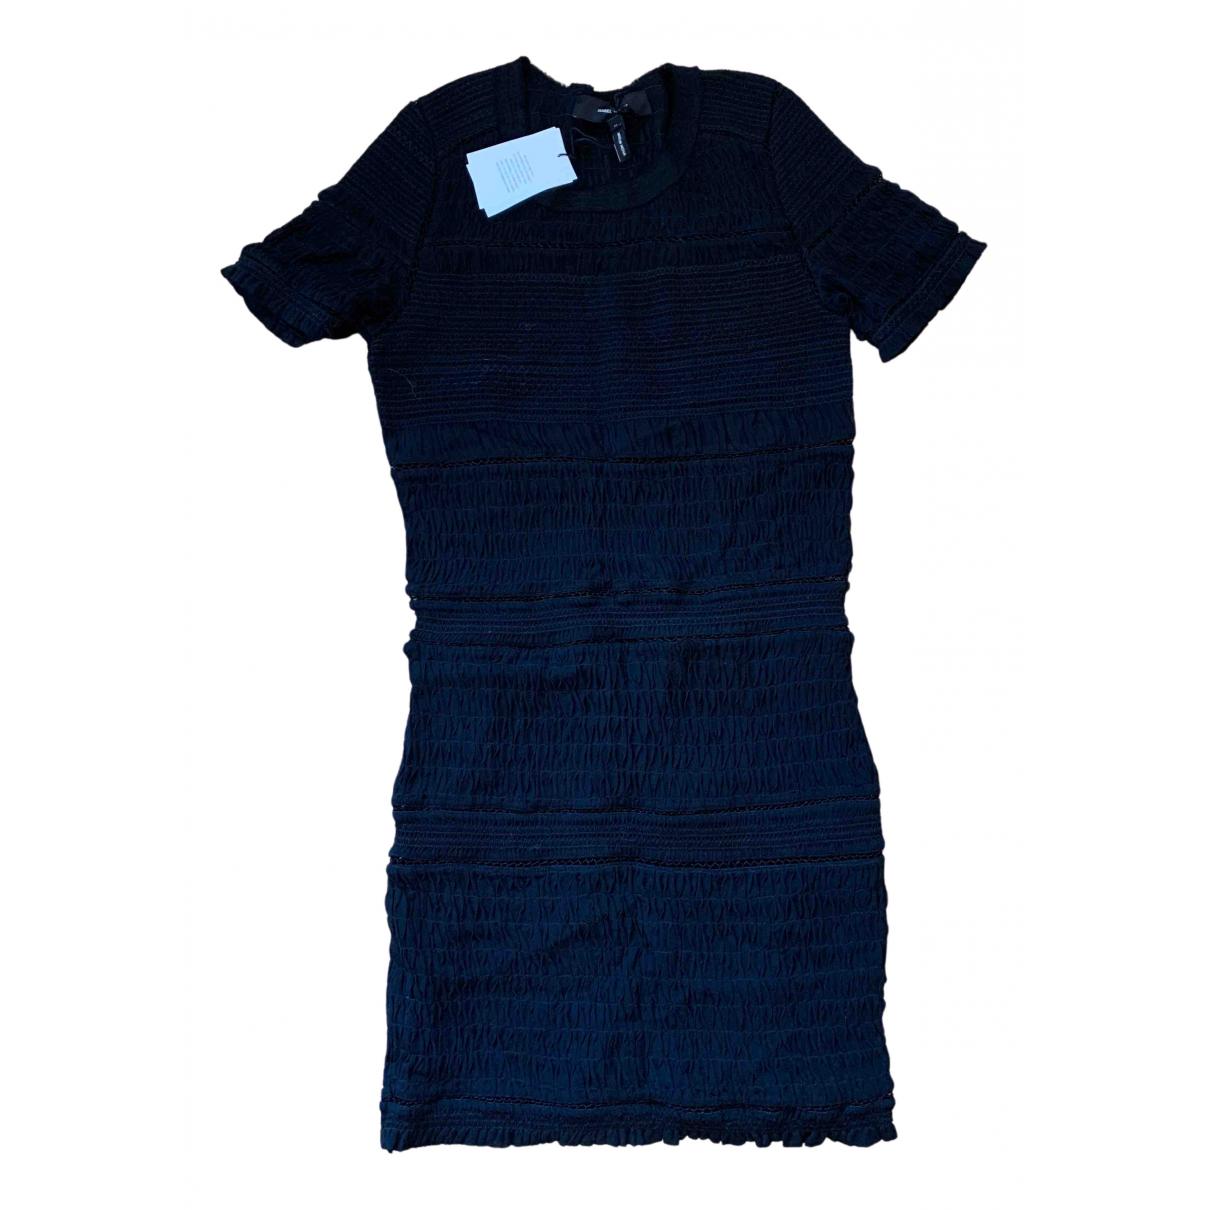 Isabel Marant N Black Silk dress for Women 38 FR